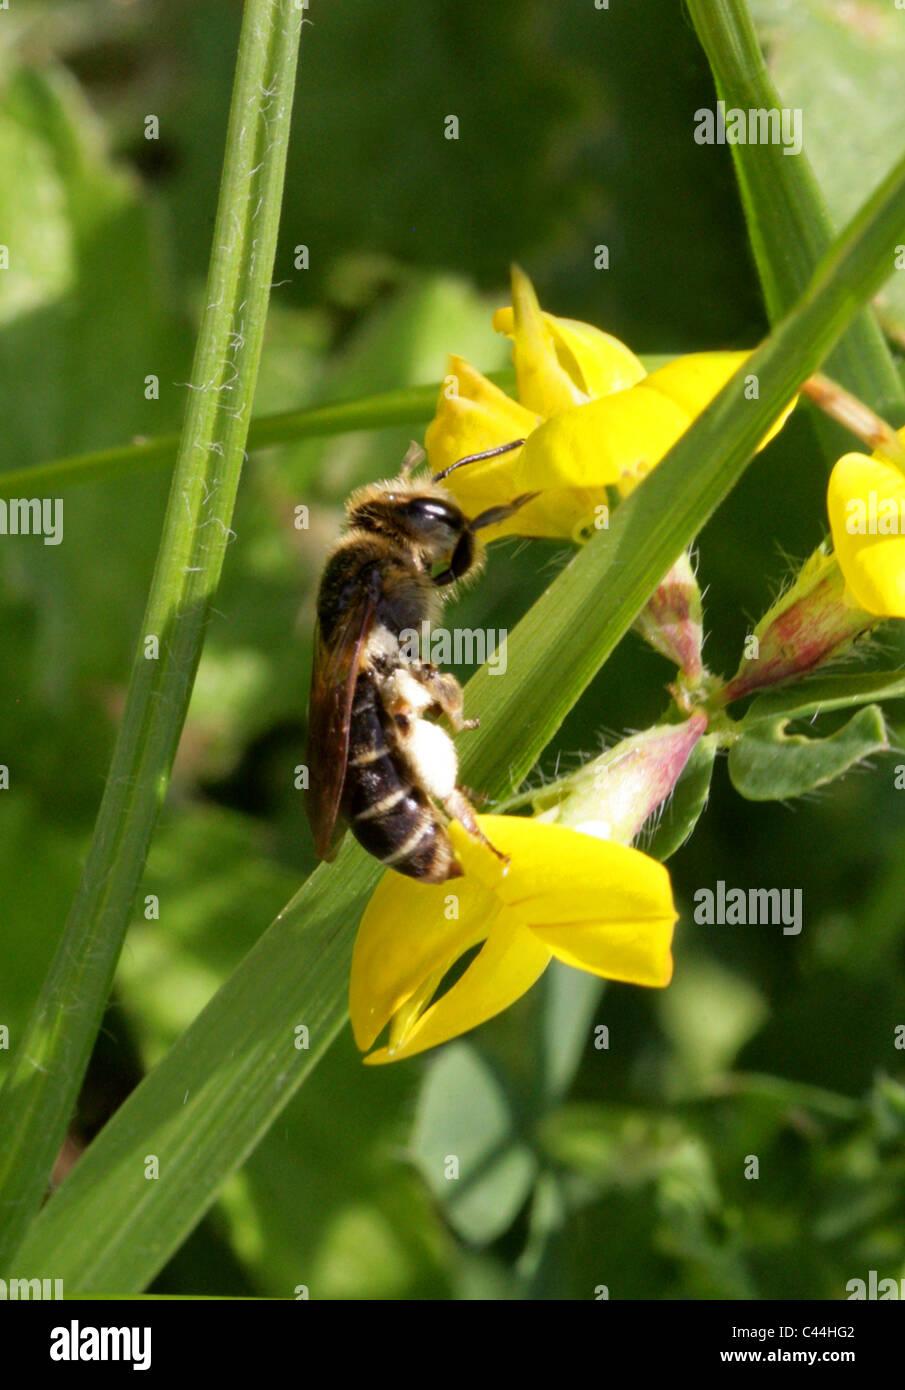 Sweat Bee, Halictus rubicundus, Halictidae, Hymenoptera. Feeding on Birdsfoot Trefoil. - Stock Image